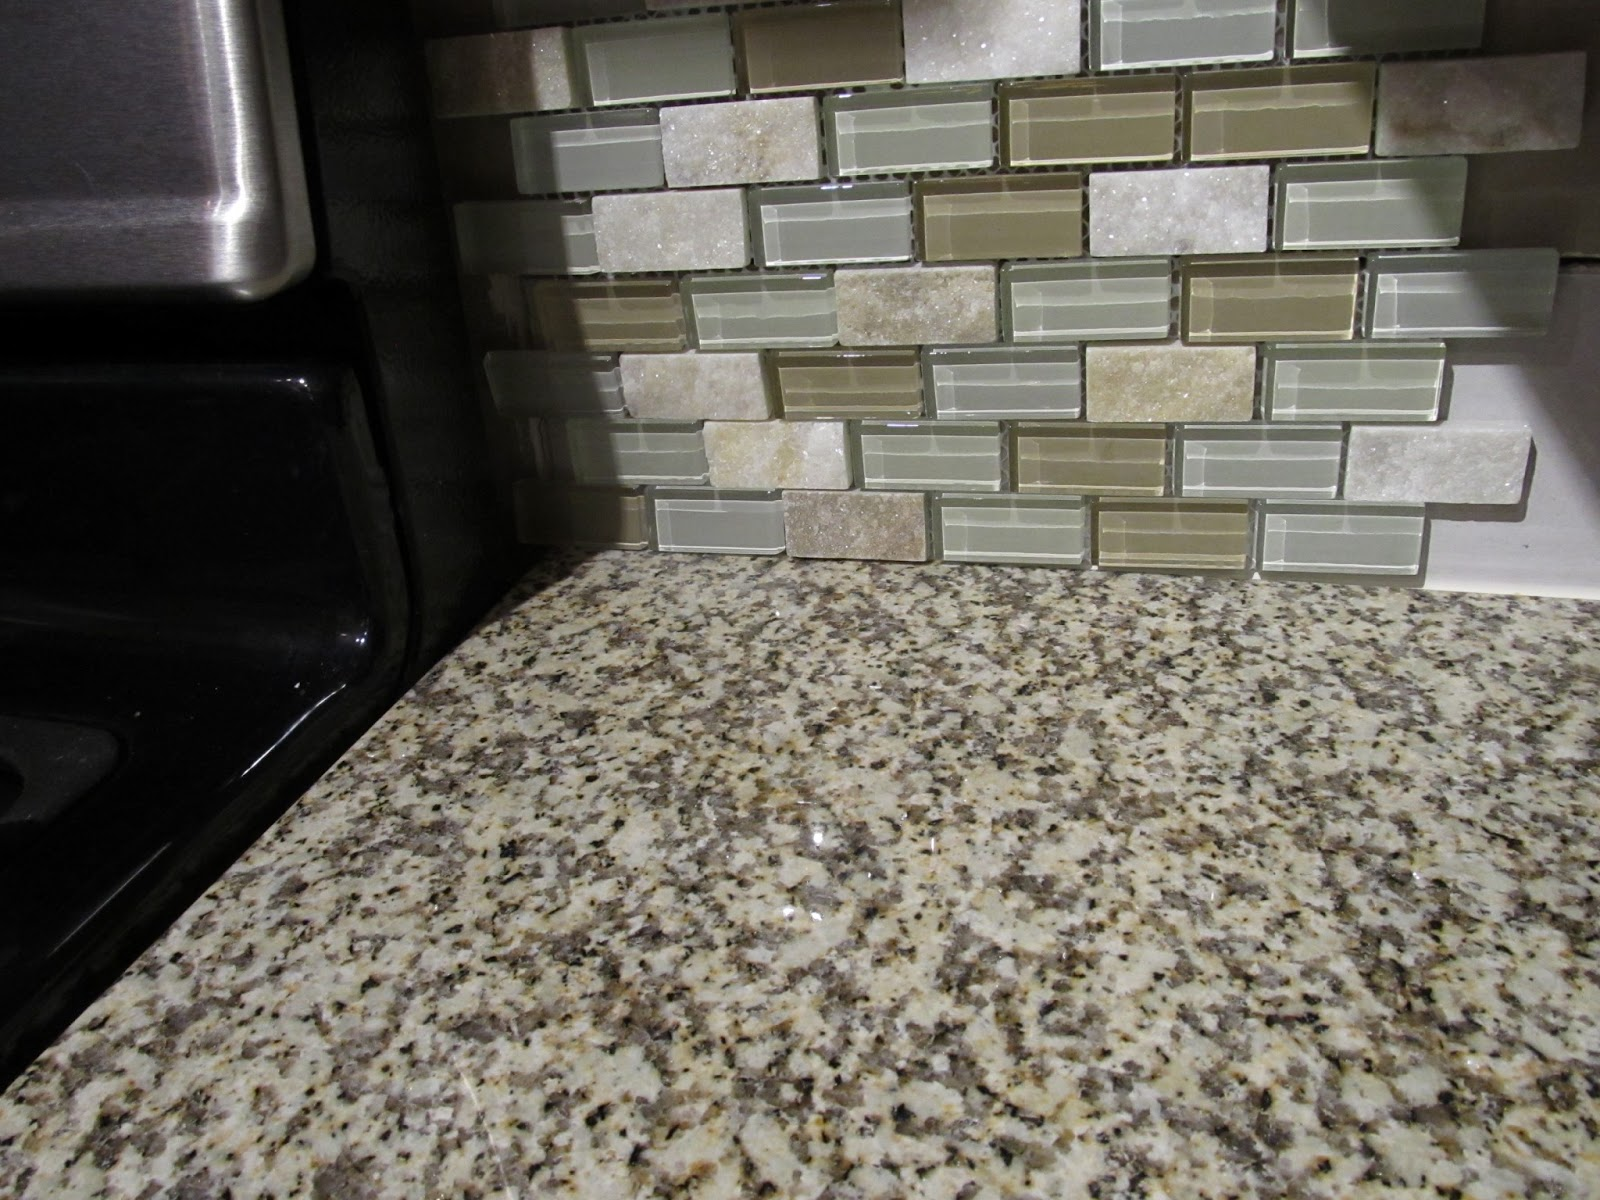 Buying Granite Countertops - Charlie The Cavalier